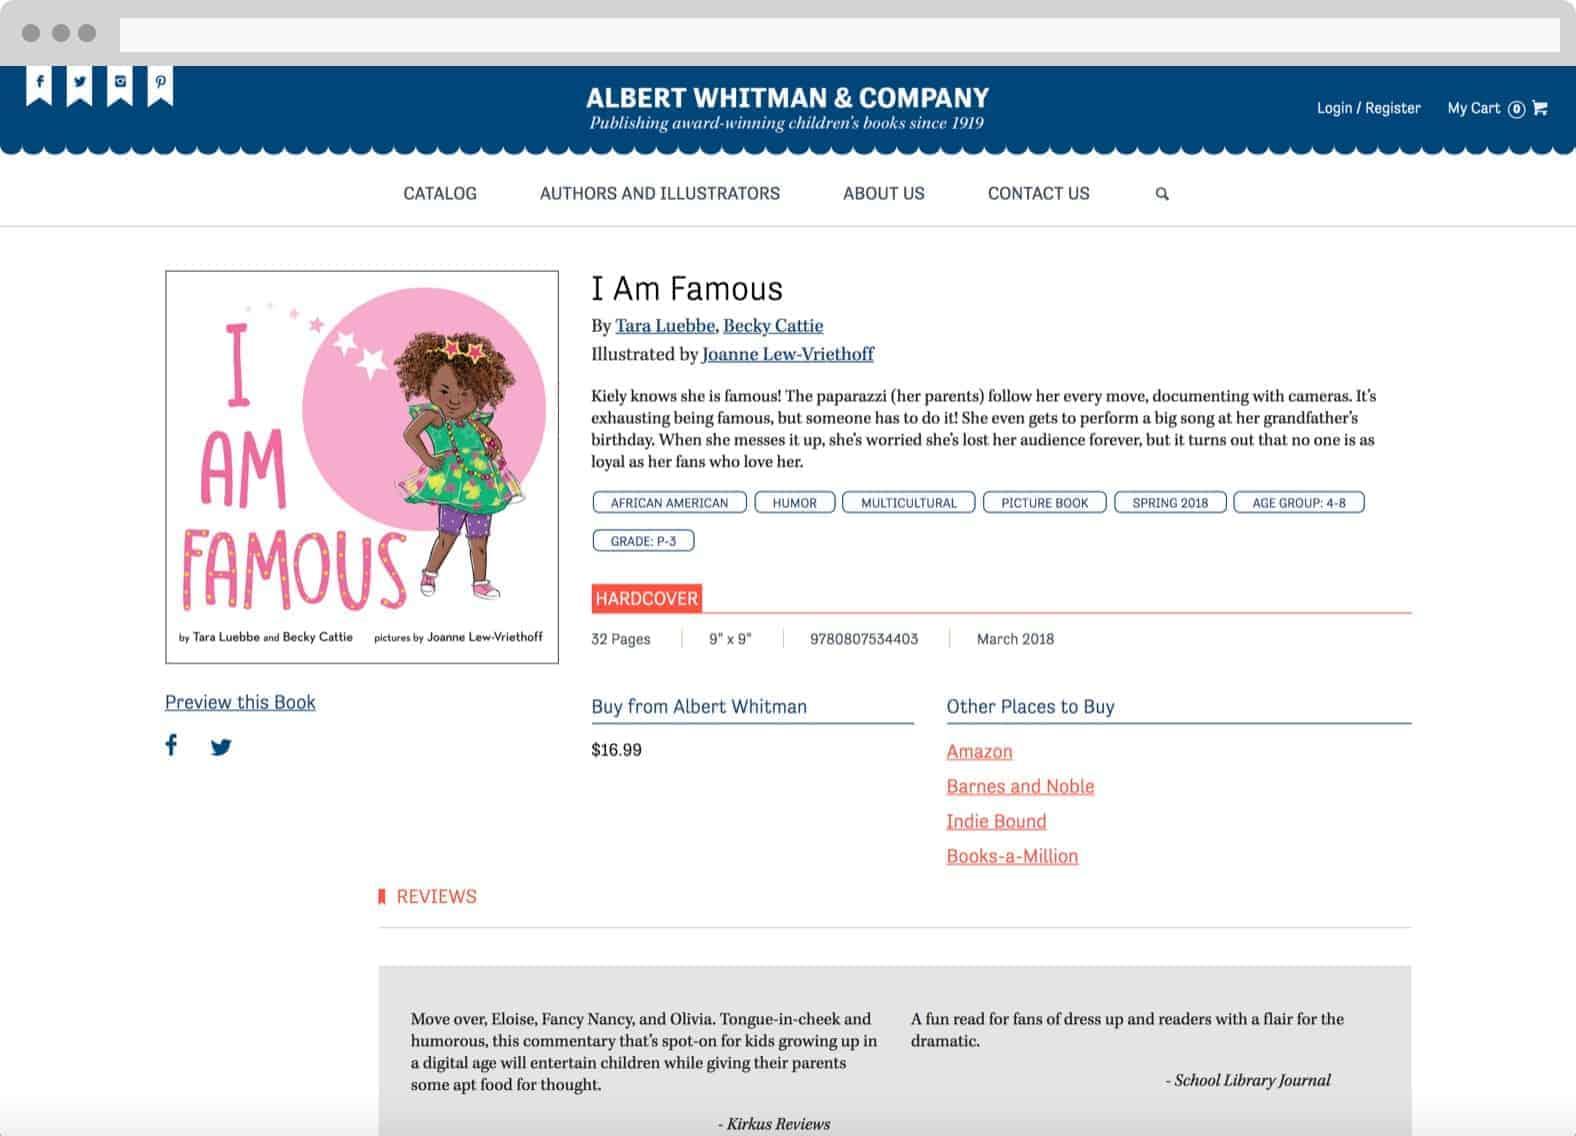 Albert Whitman & Company website